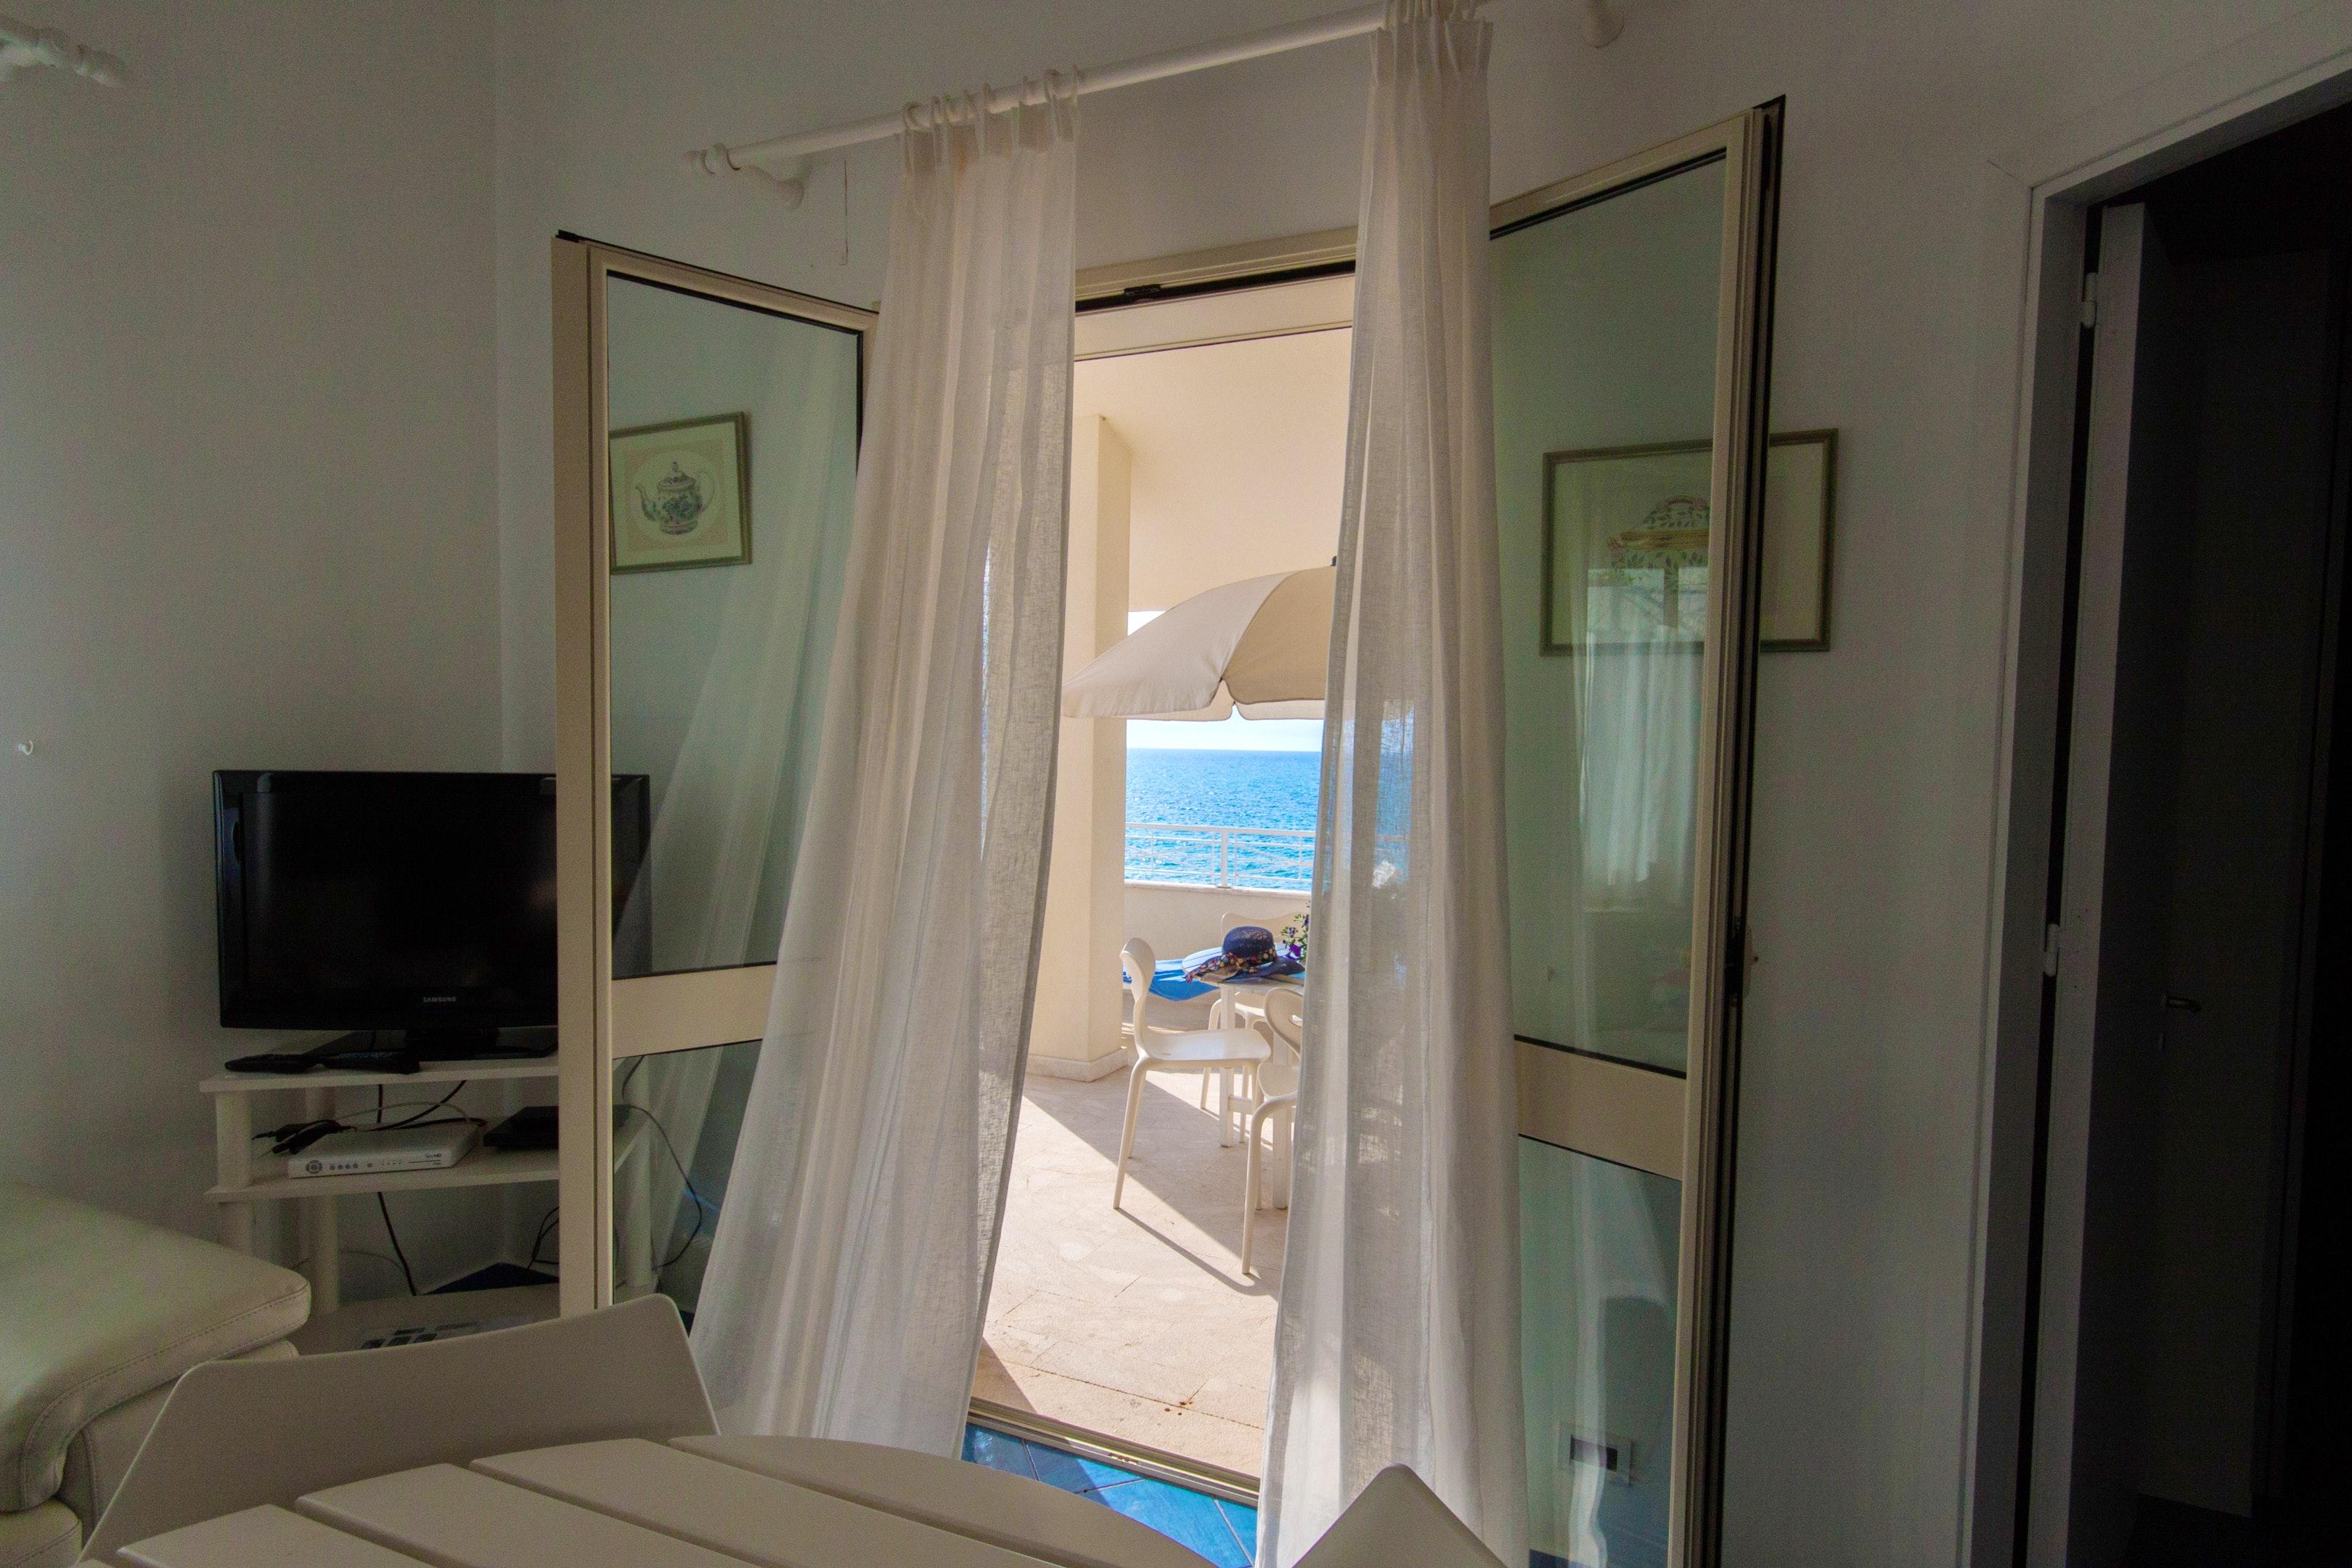 Holiday apartment Wohnung mit 3 Schlafzimmern in Piano di Trappeto mit herrlichem Meerblick, möblierter Terr (2271436), Balestrate, Palermo, Sicily, Italy, picture 8